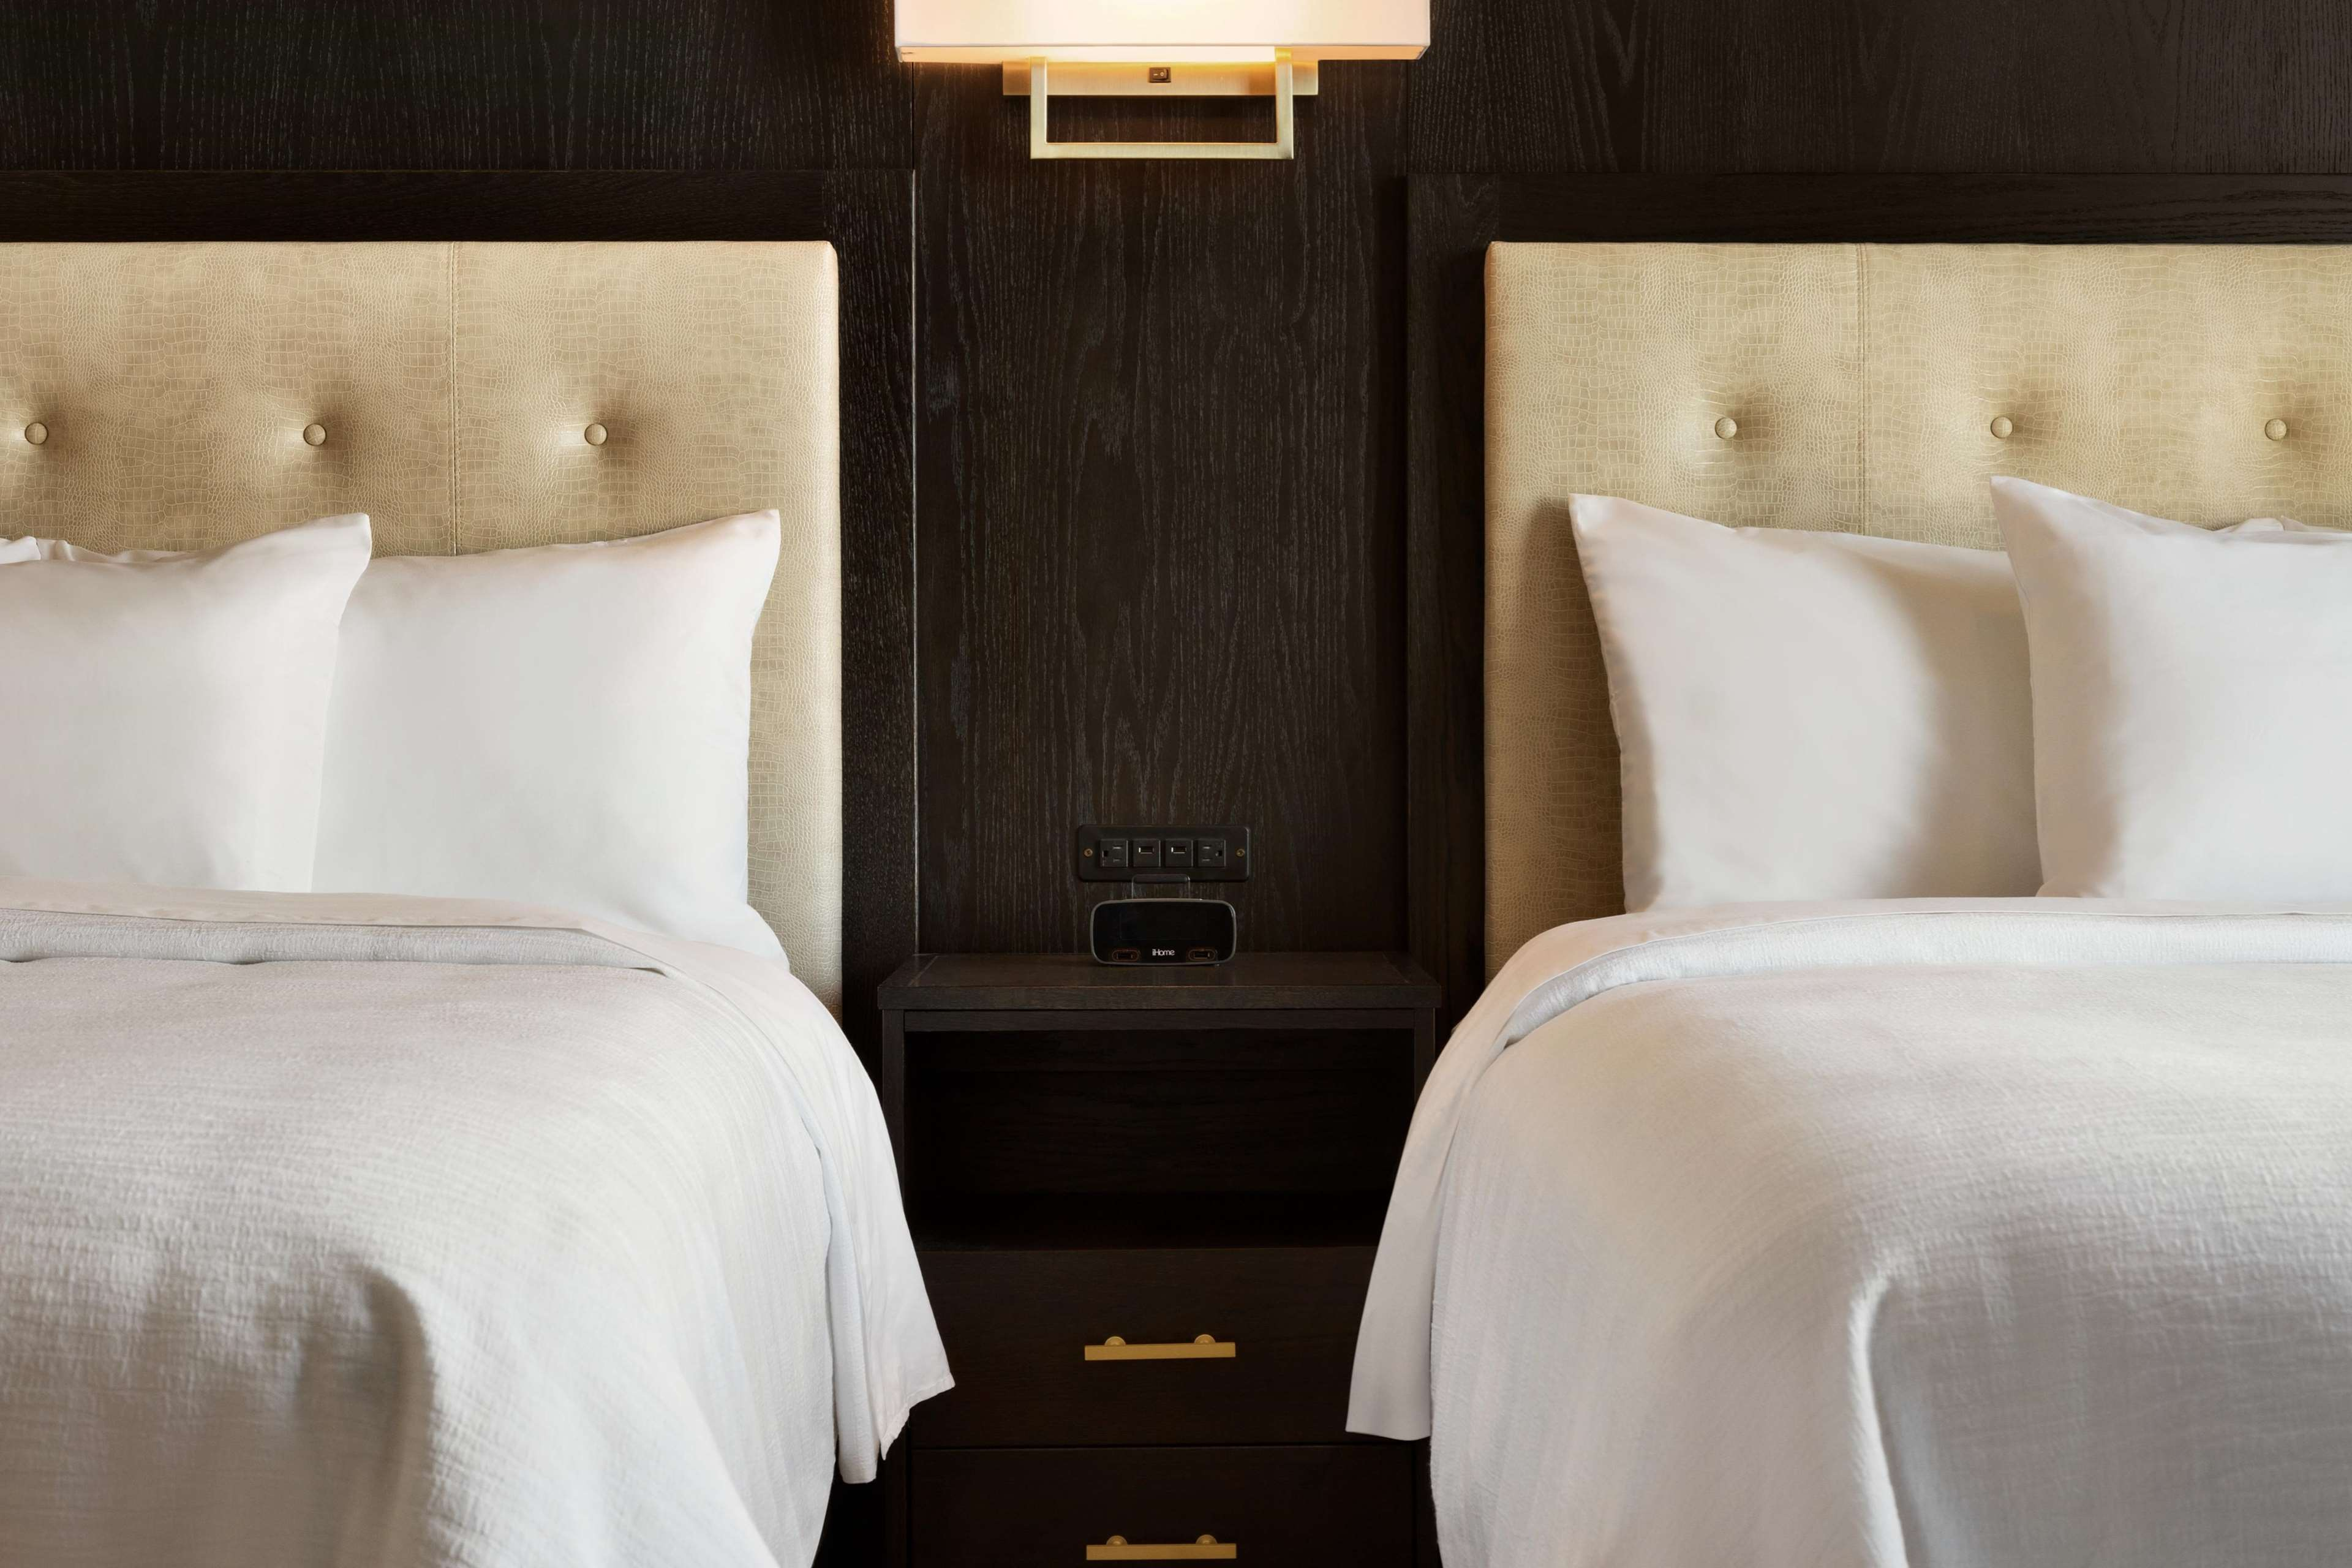 Embassy Suites by Hilton Syracuse Destiny USA image 1